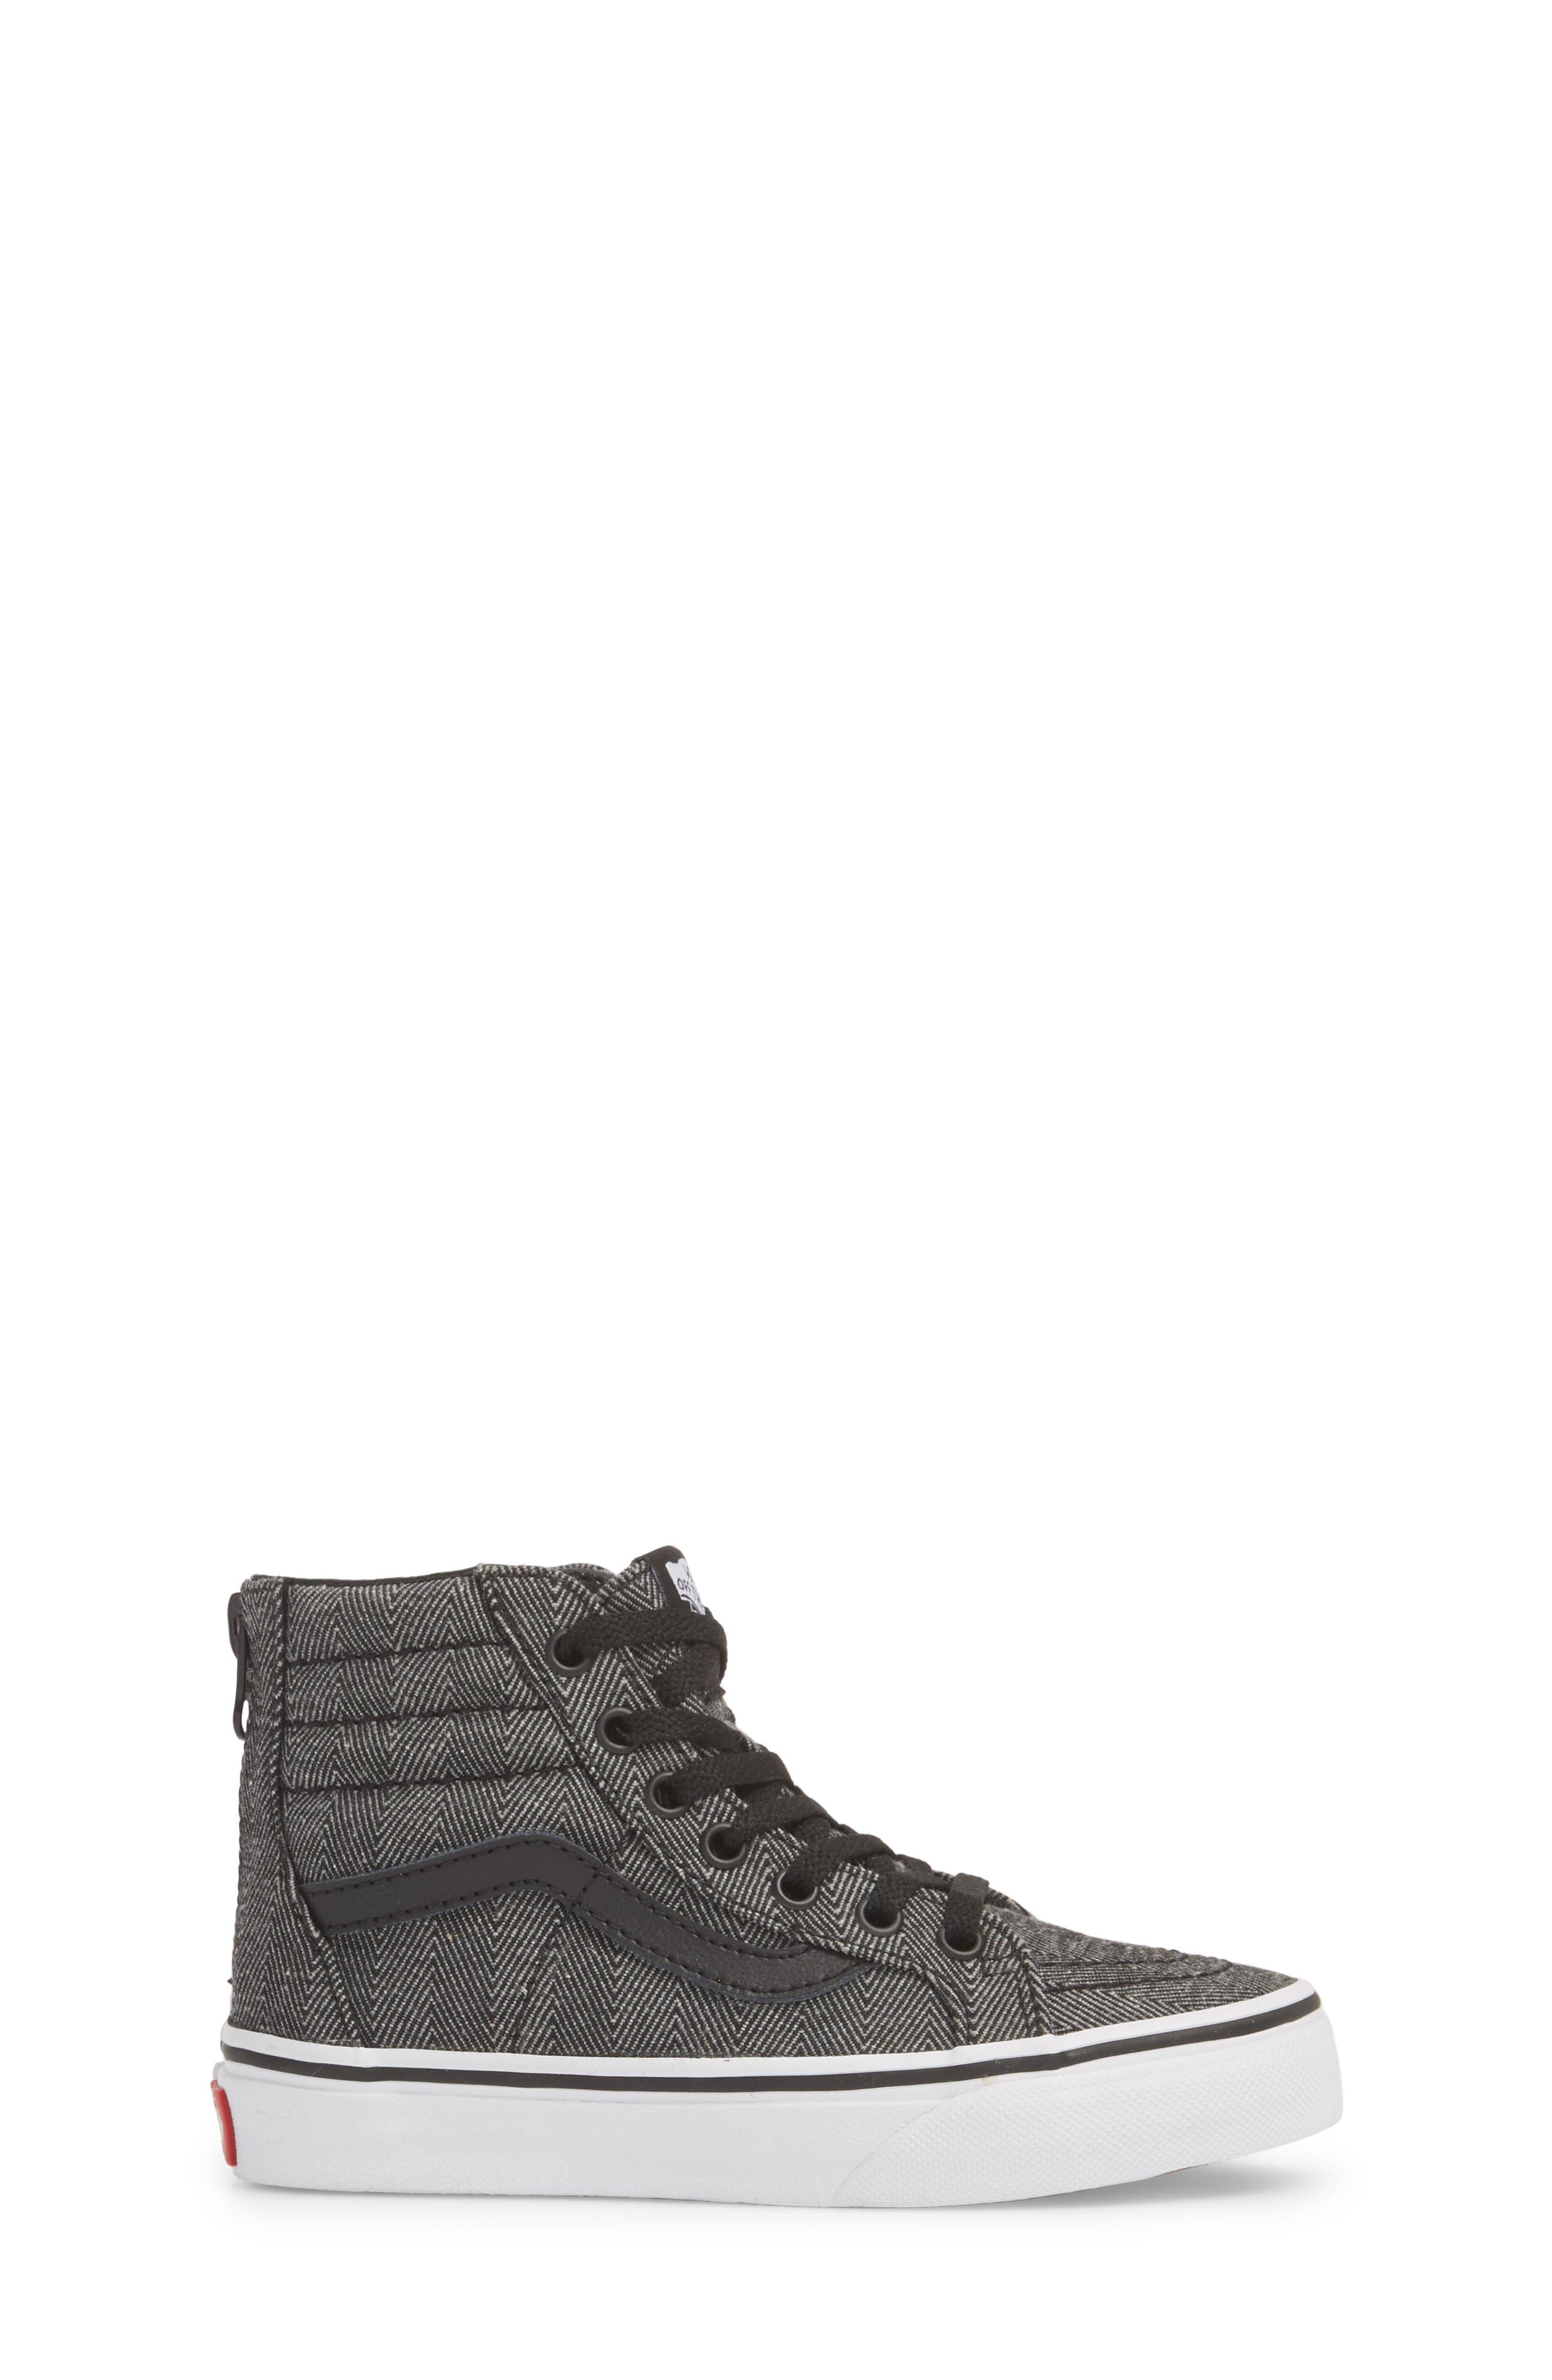 'Sk8-Hi' Sneaker,                             Alternate thumbnail 3, color,                             HERRINGBONE BLACK/ TRUE WHITE